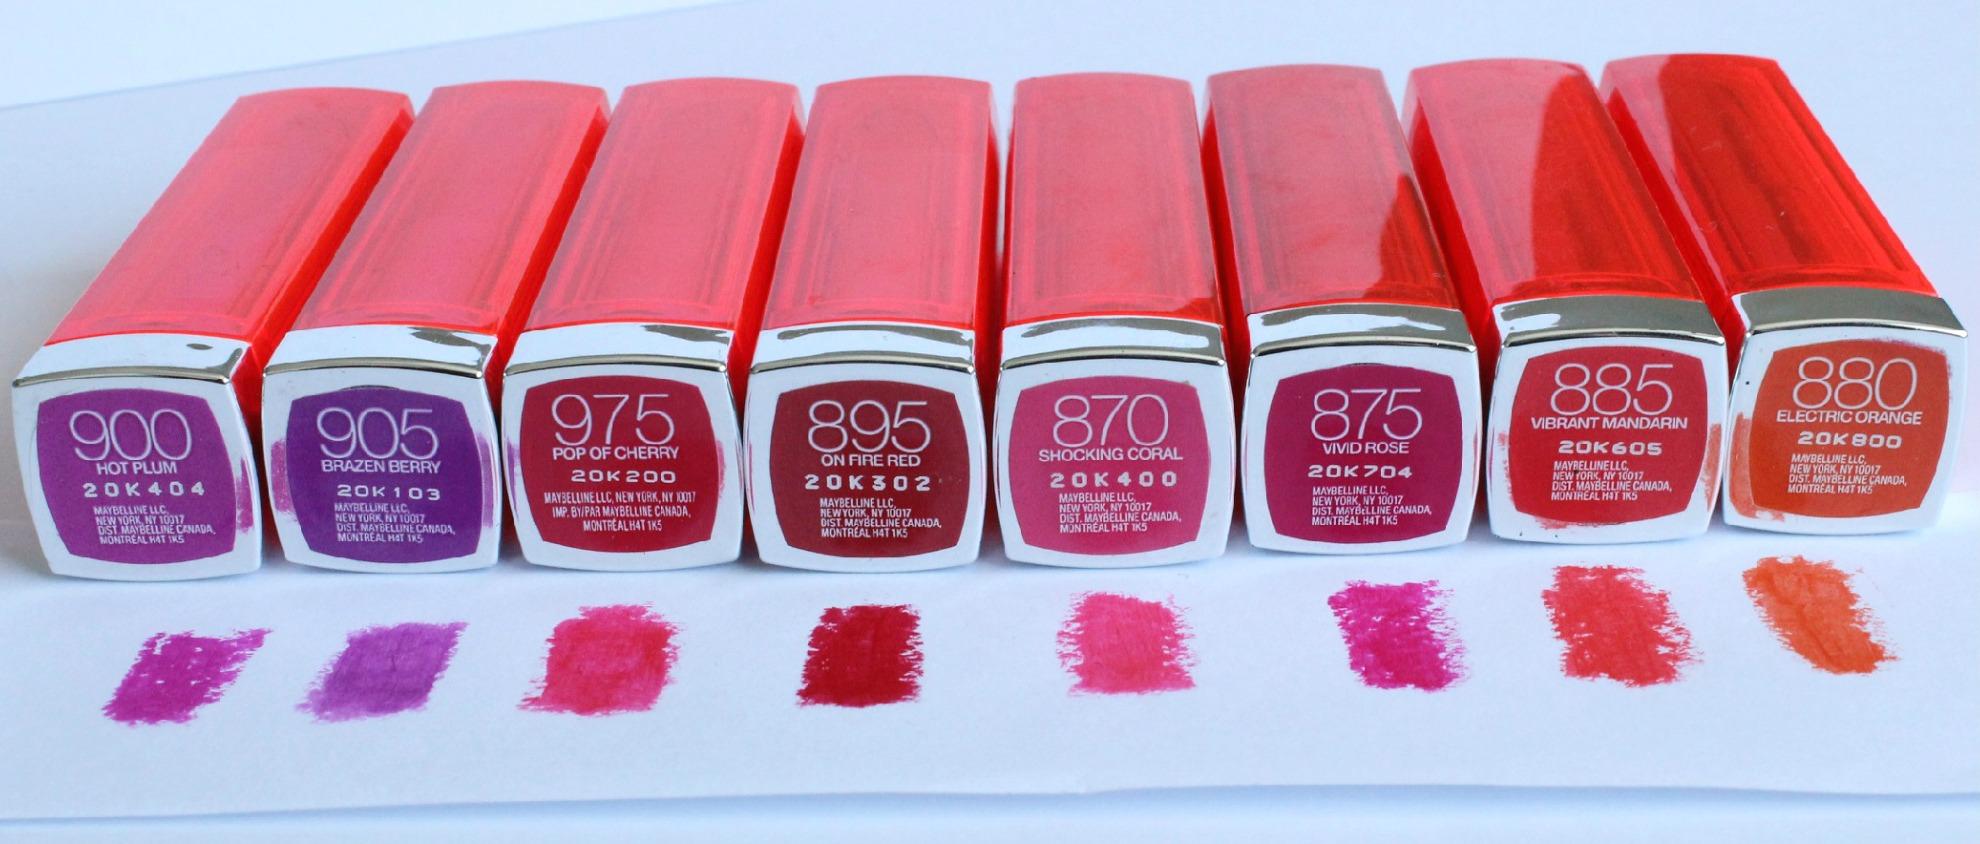 Maybelline Color Sensational Lipstick Shades